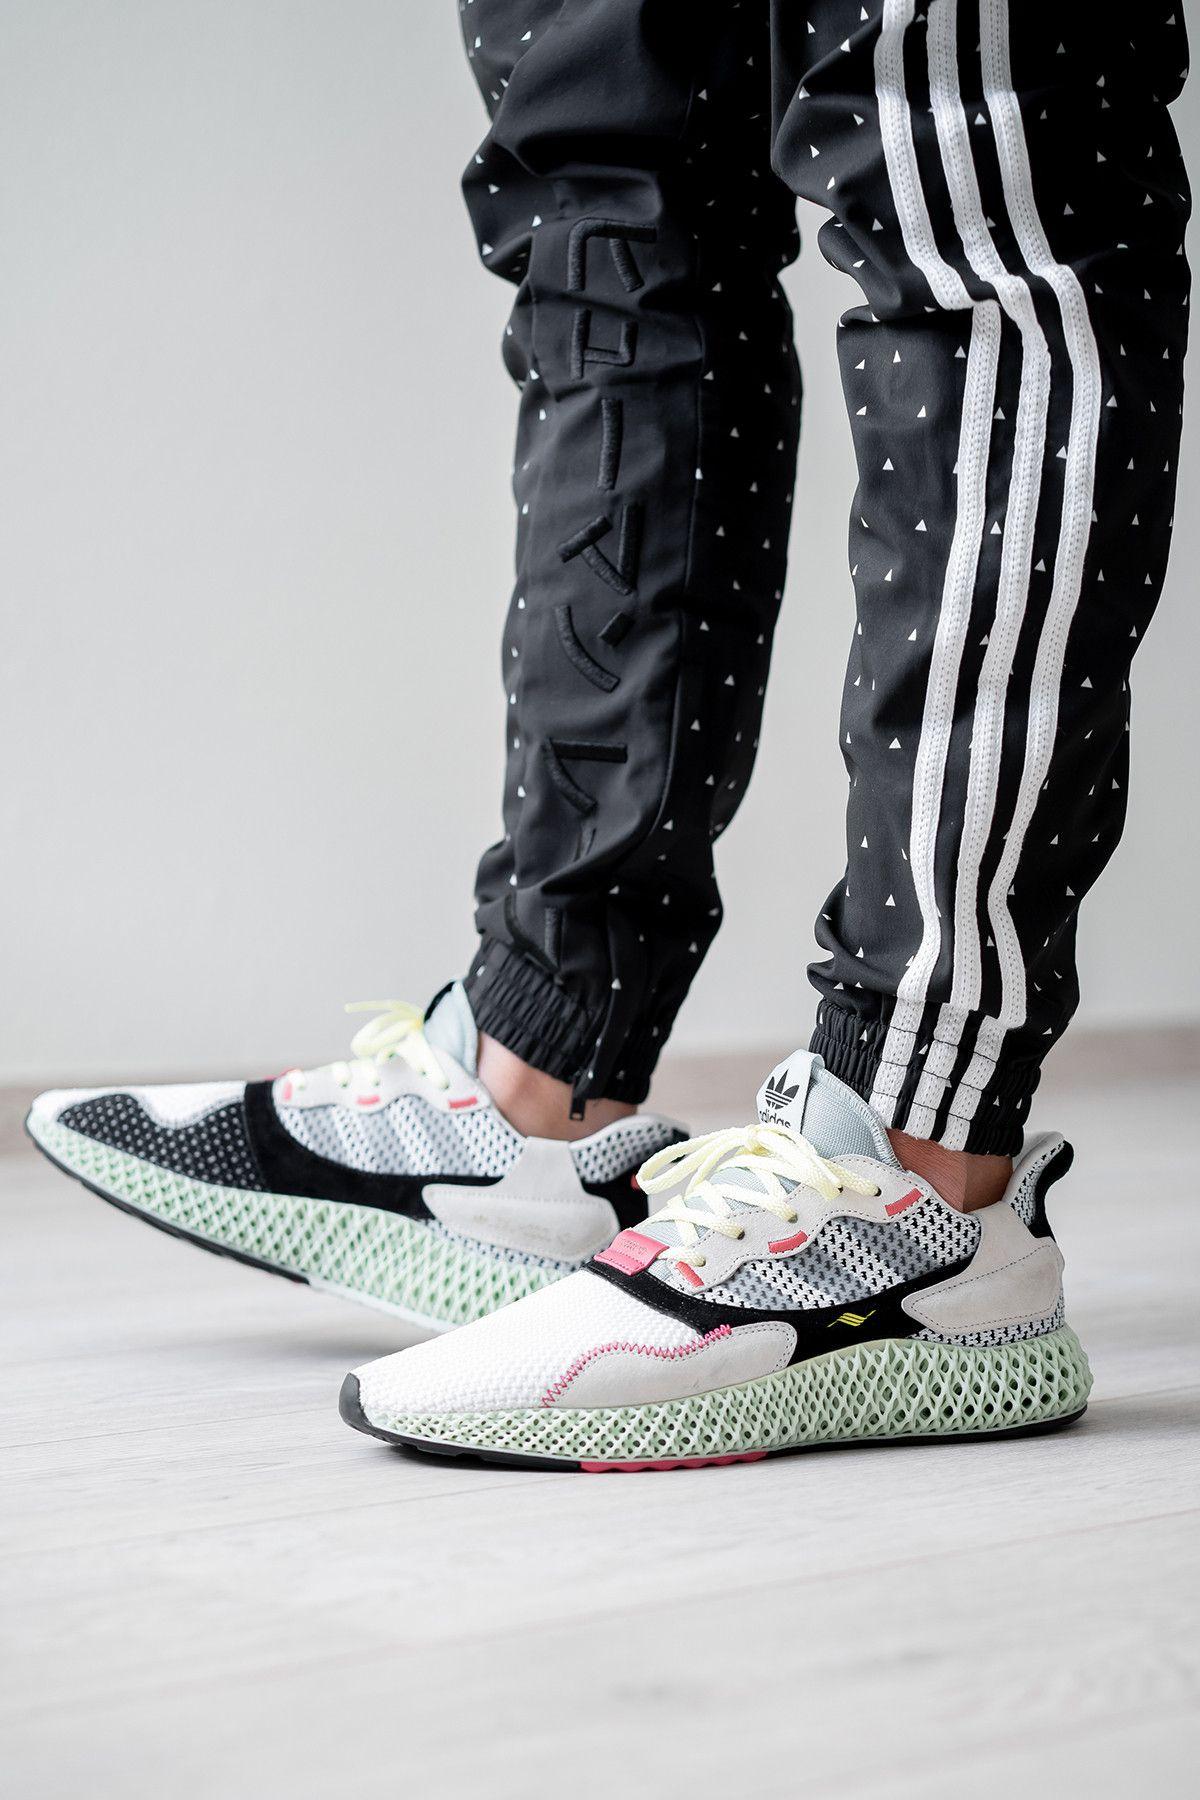 new styles 61db9 24530 搶先預覽 adidas 革新混血跑鞋 ZX 4000 4D